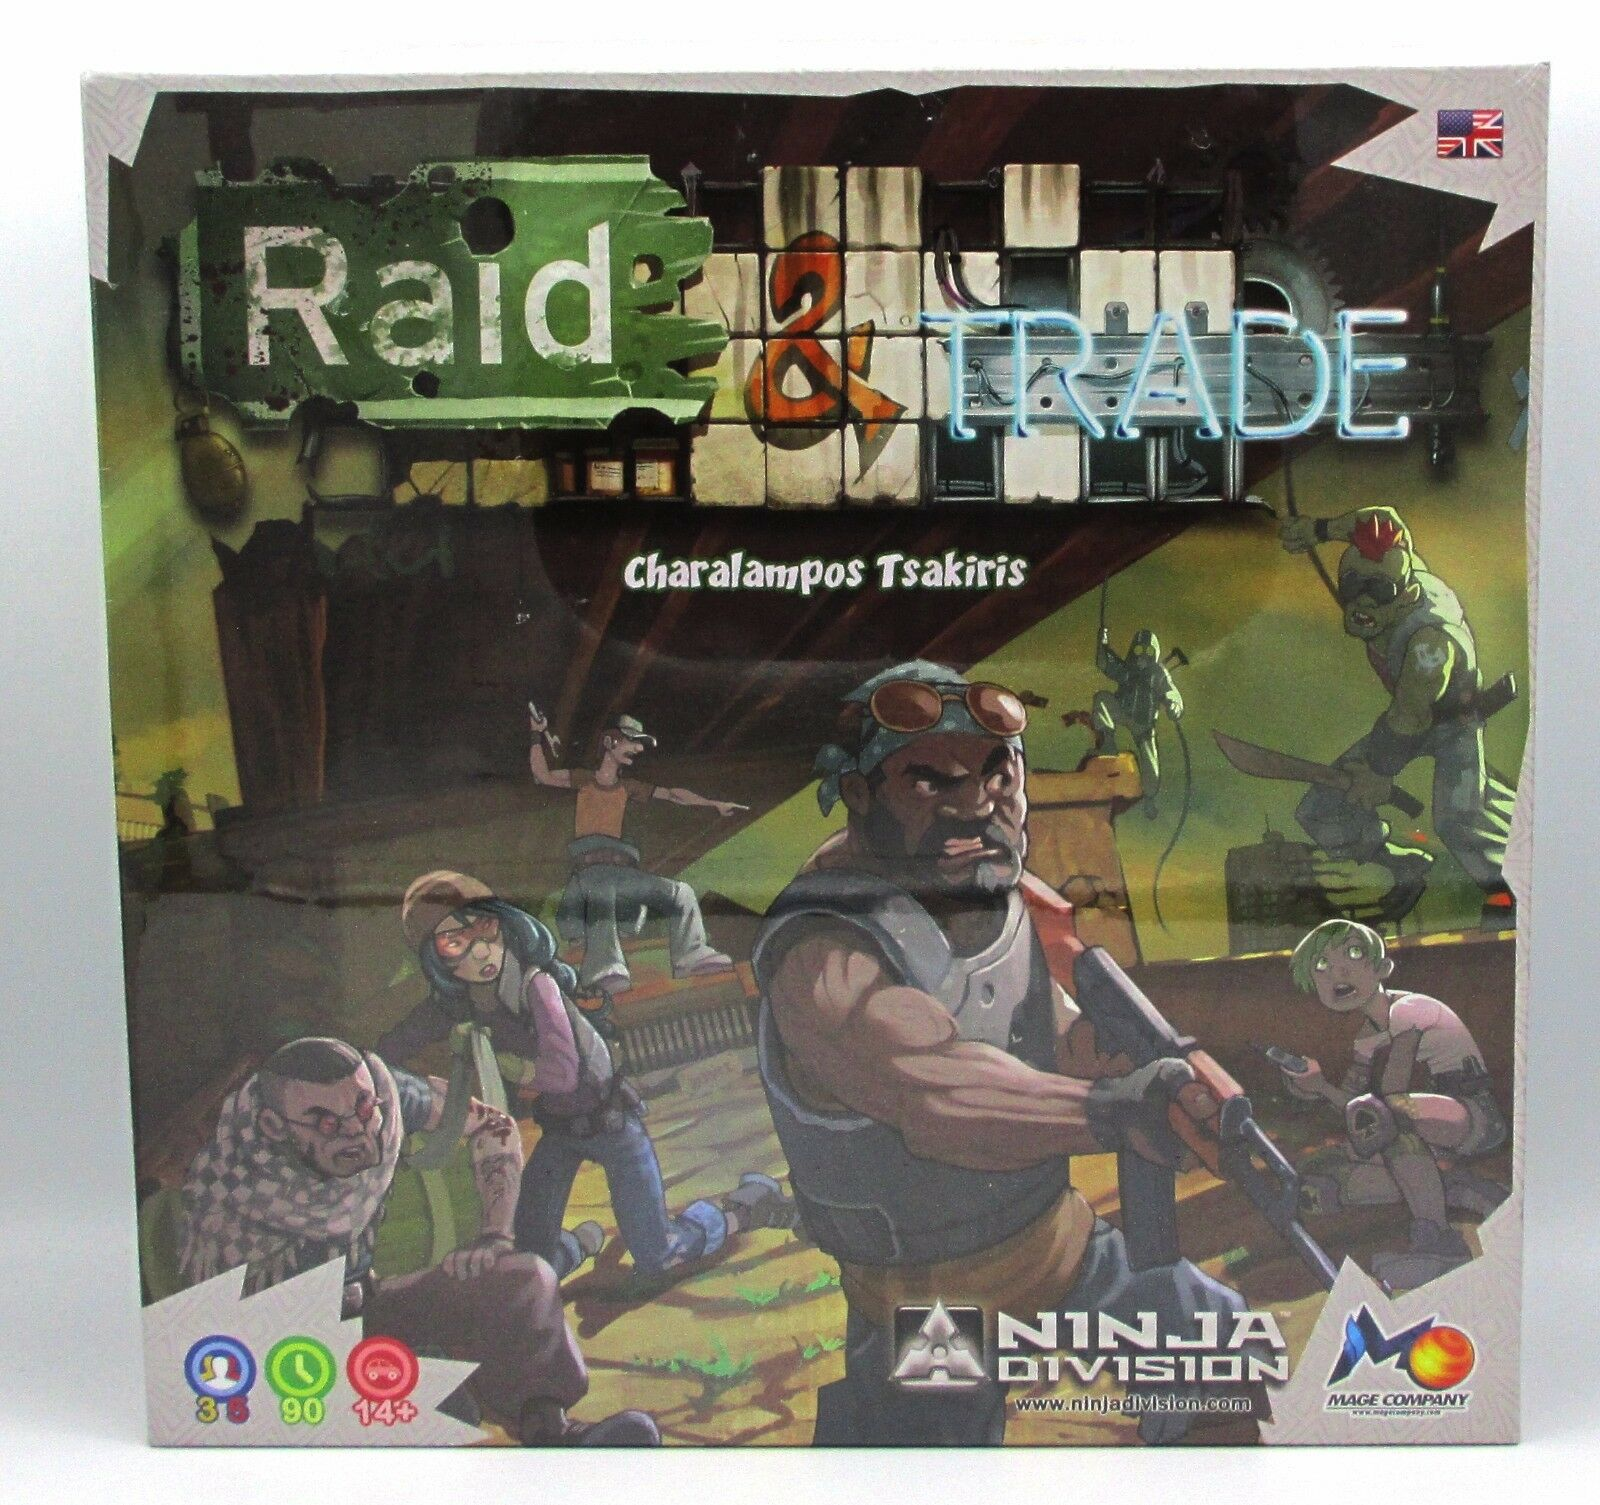 Razzia & handel 420101 brettspiel post - apokalyptischen überleben brettspiel.